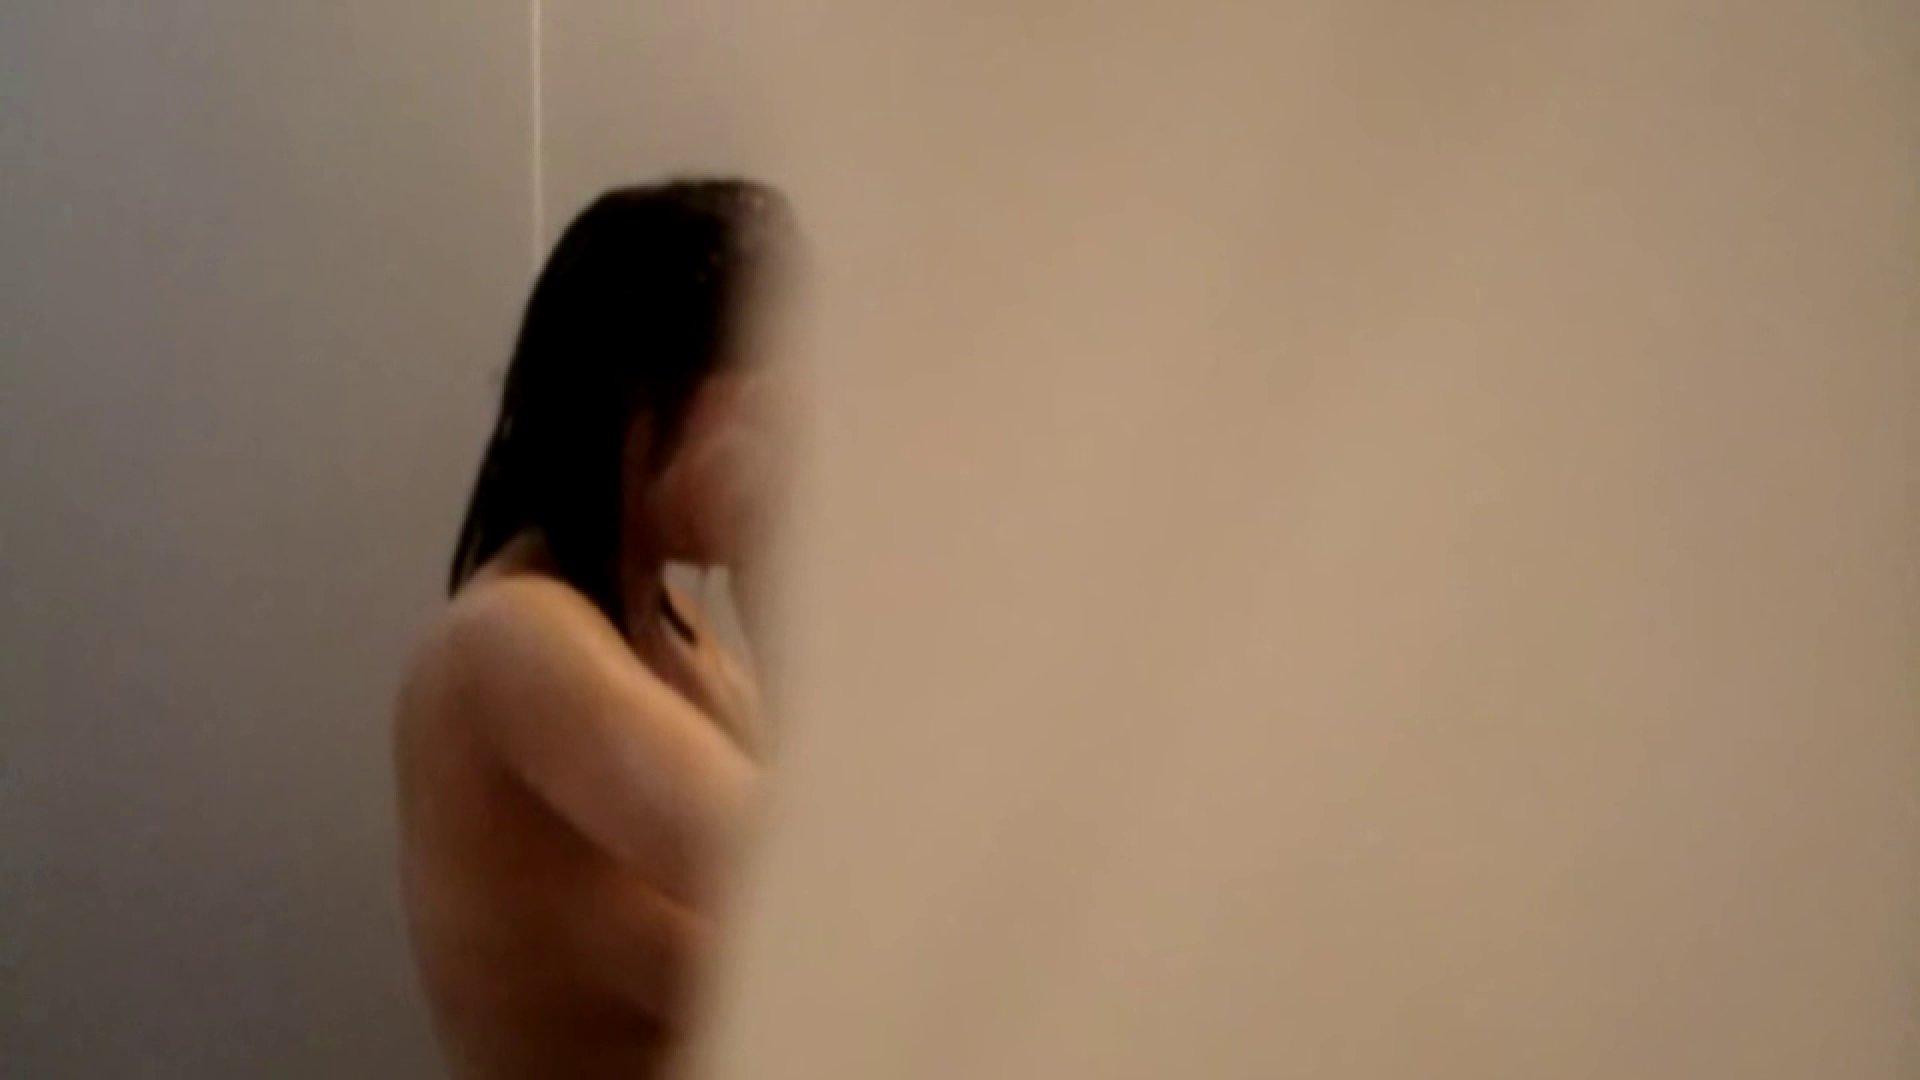 vol.2 葵のグラドル顔負けの爆乳を入浴シーンでどうぞ。 ○族 すけべAV動画紹介 110枚 22